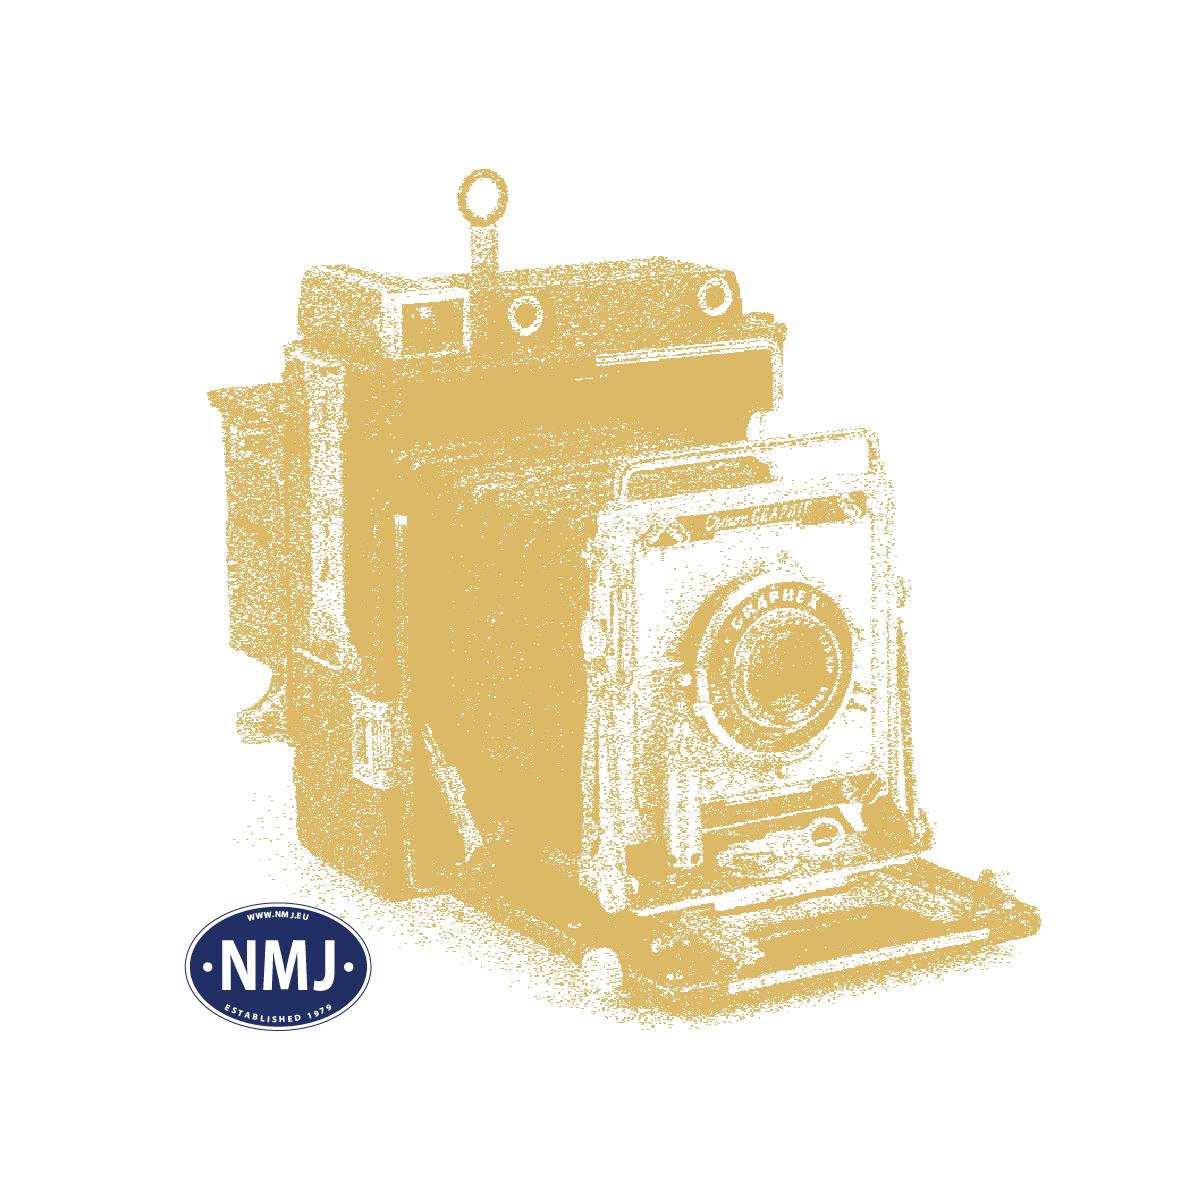 PECPL-1001 - Twistlock Pensemotor og Dobbel Microbryter